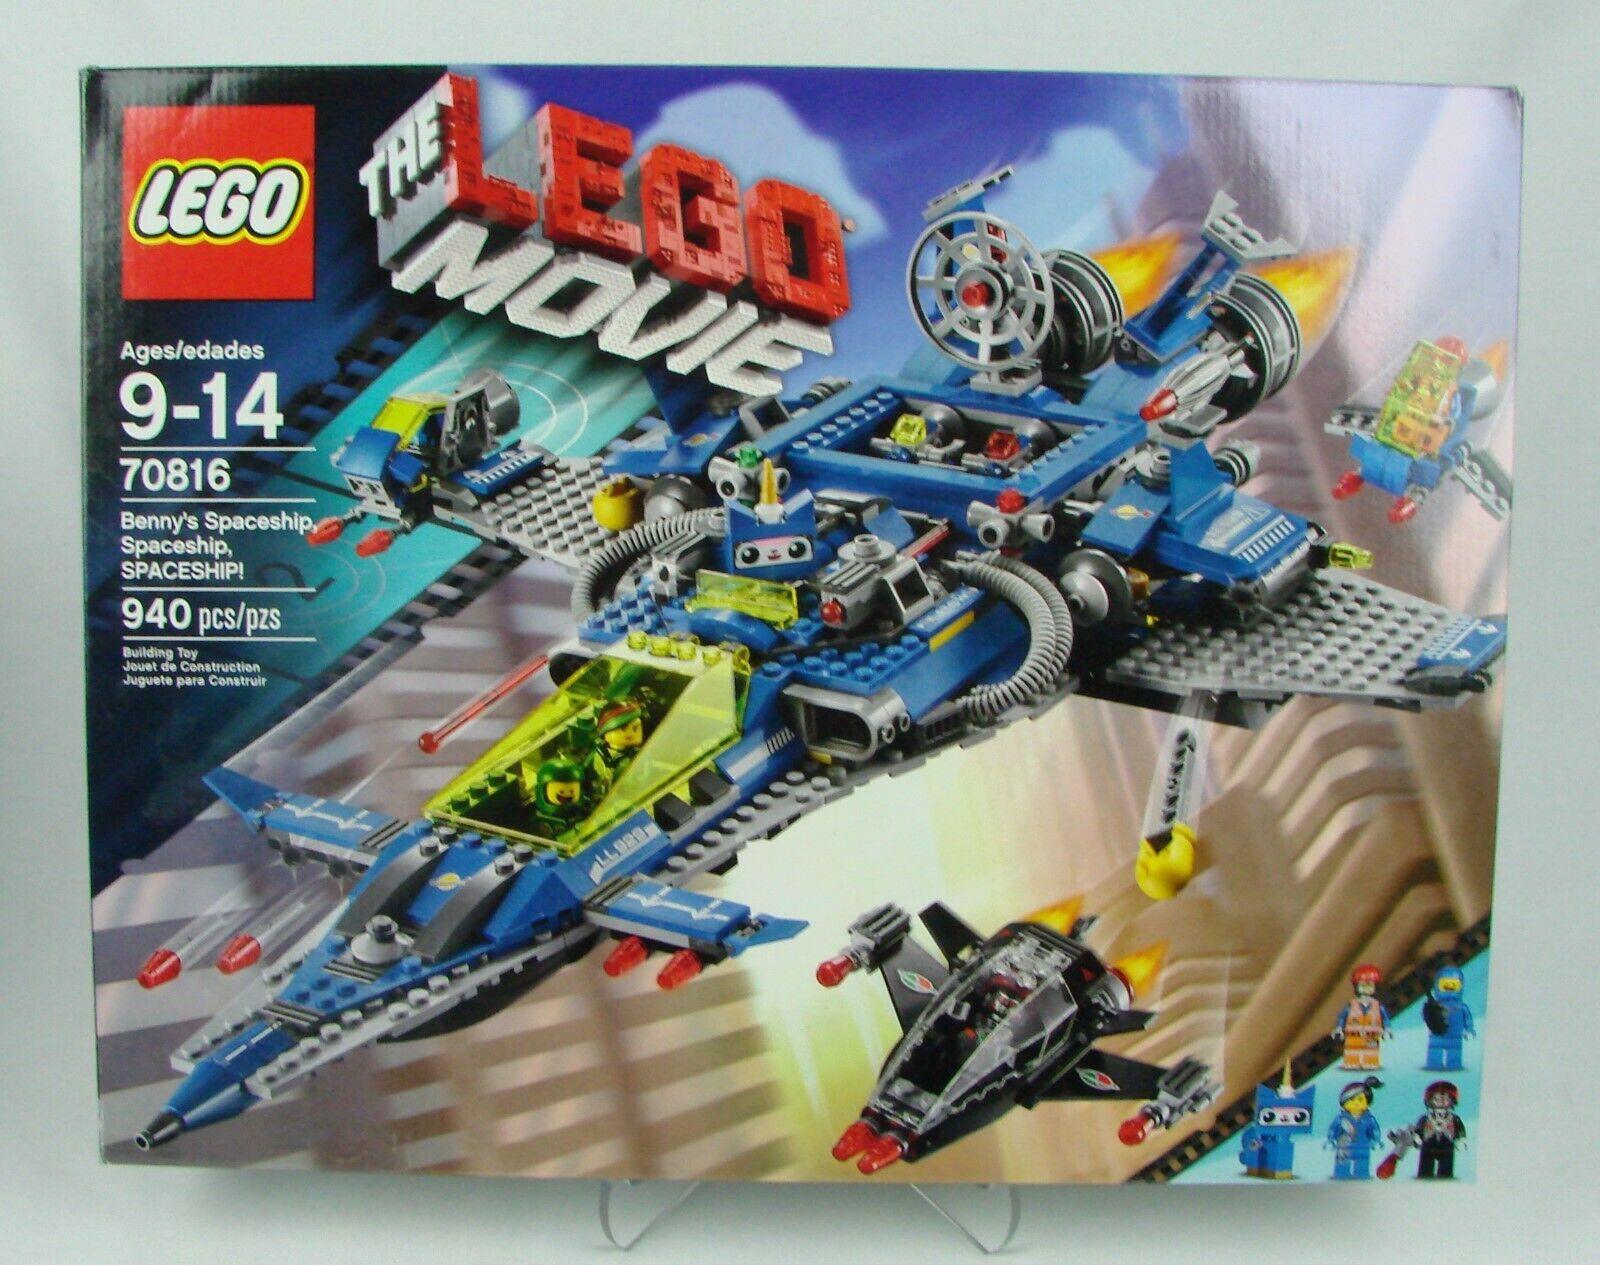 Lego  The Lego Movie   Benny's Spaceship   940 pcs (2014)  NISB